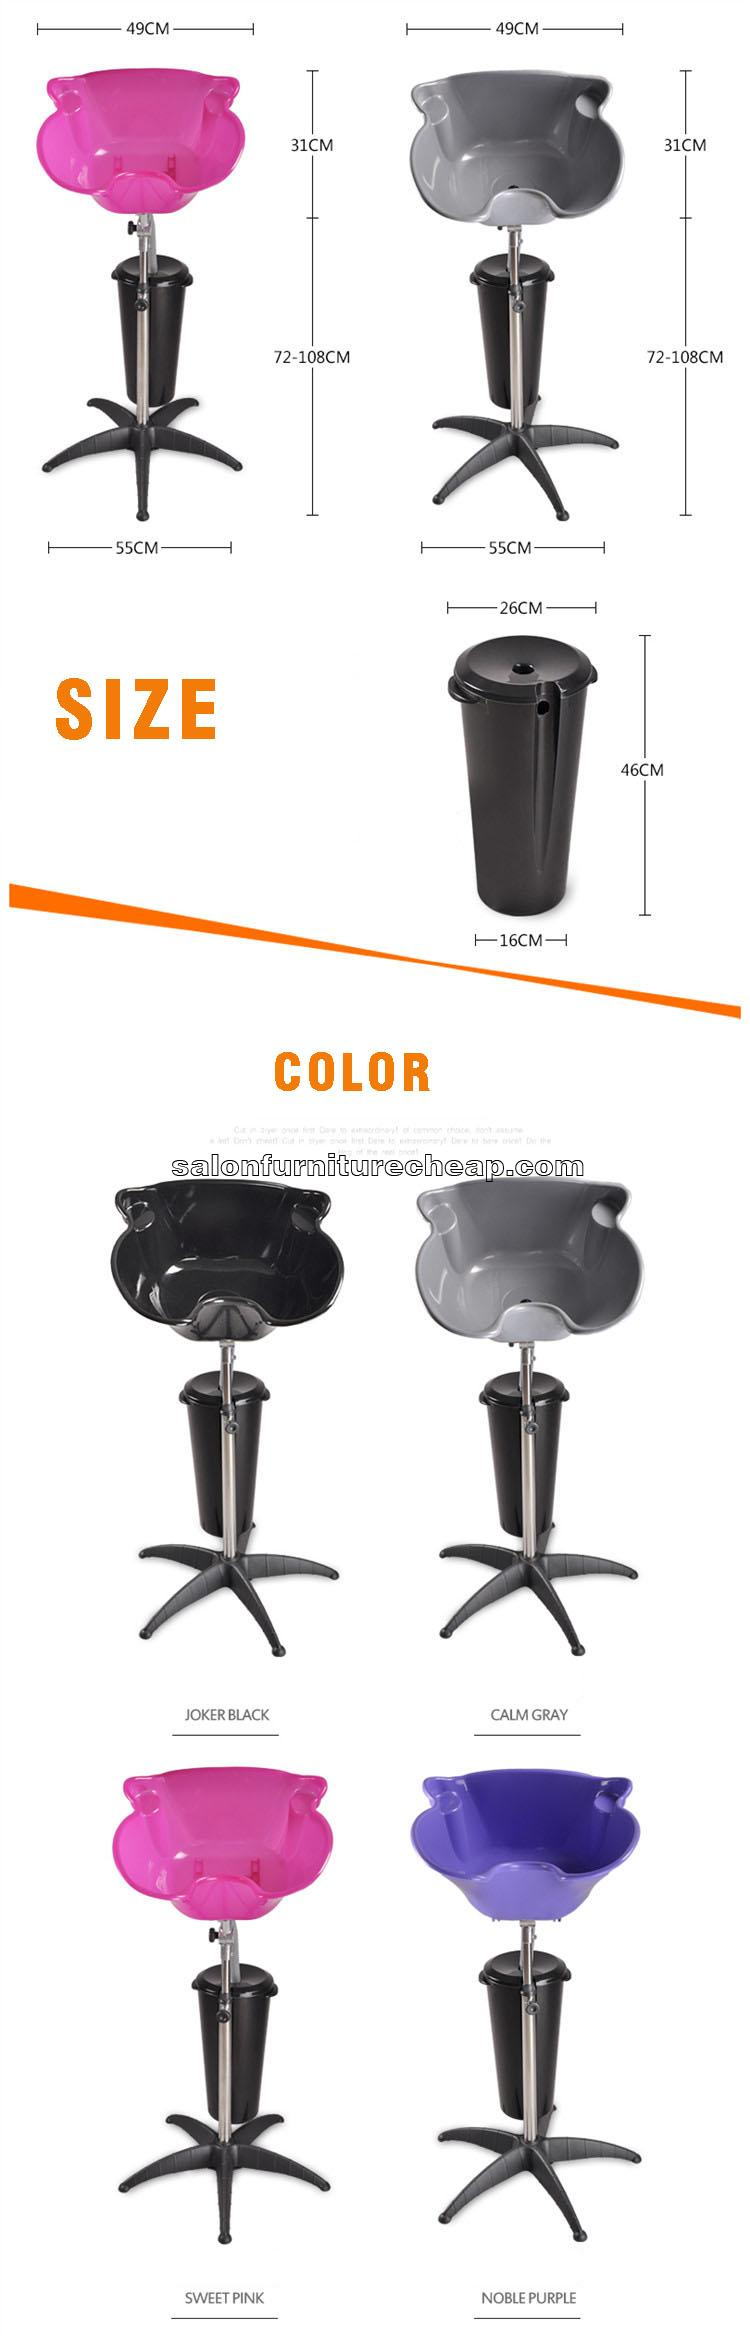 Portable Shampoo Sink Height Adjustable